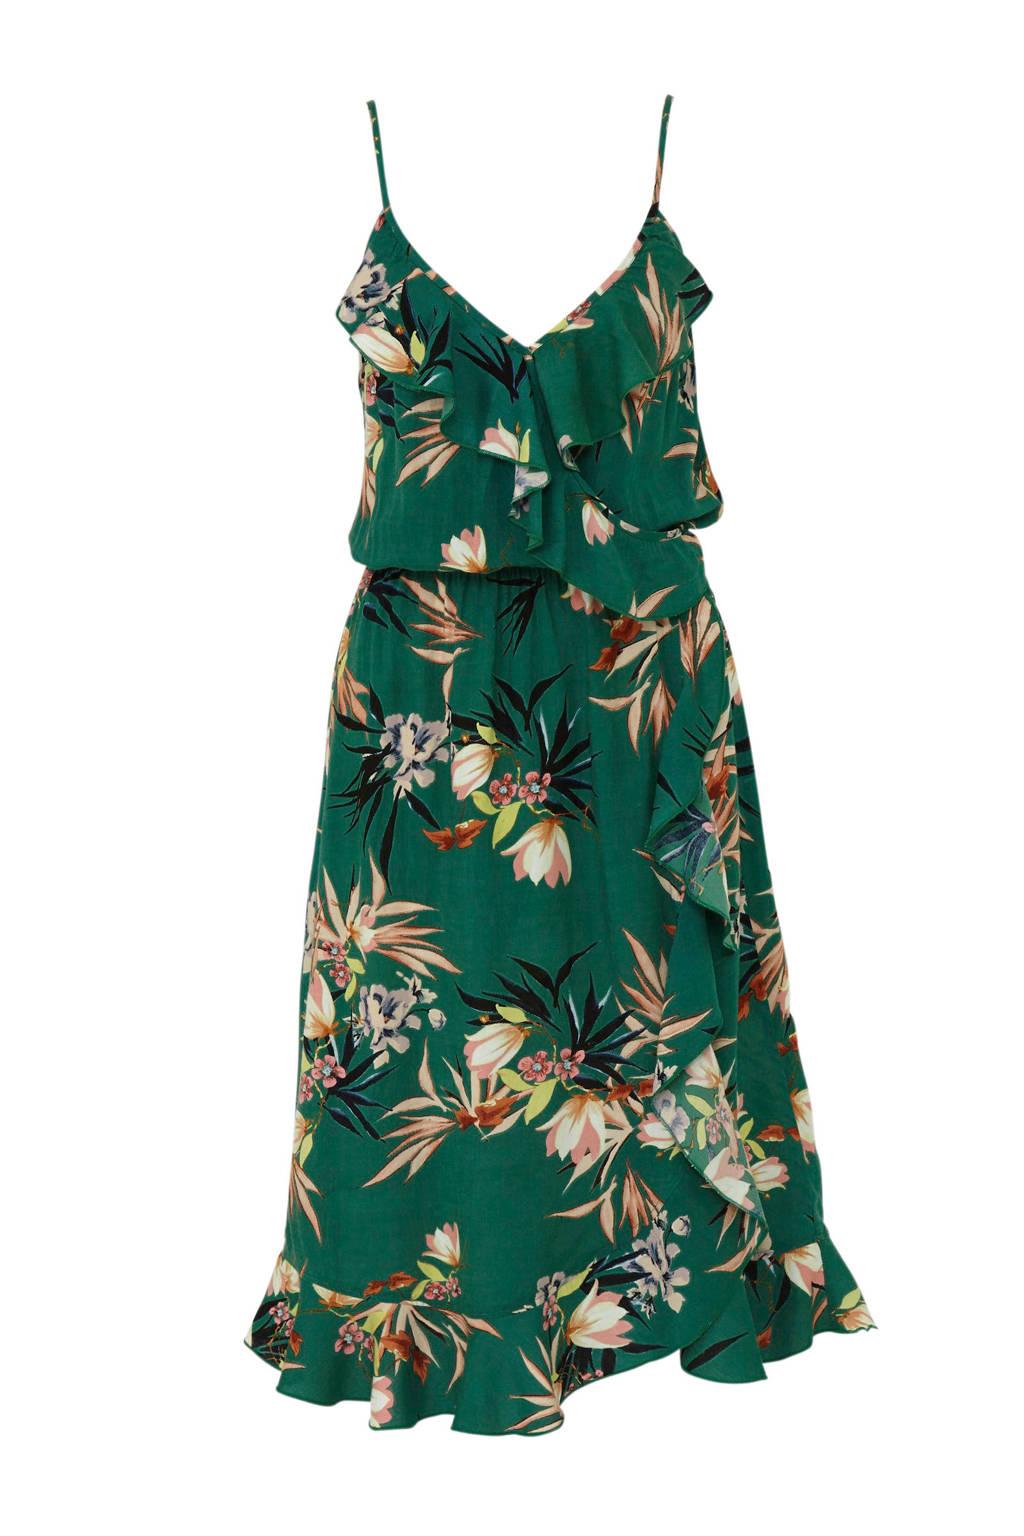 whkmp's beachwave gebloemde jurk met volant groen, Groen